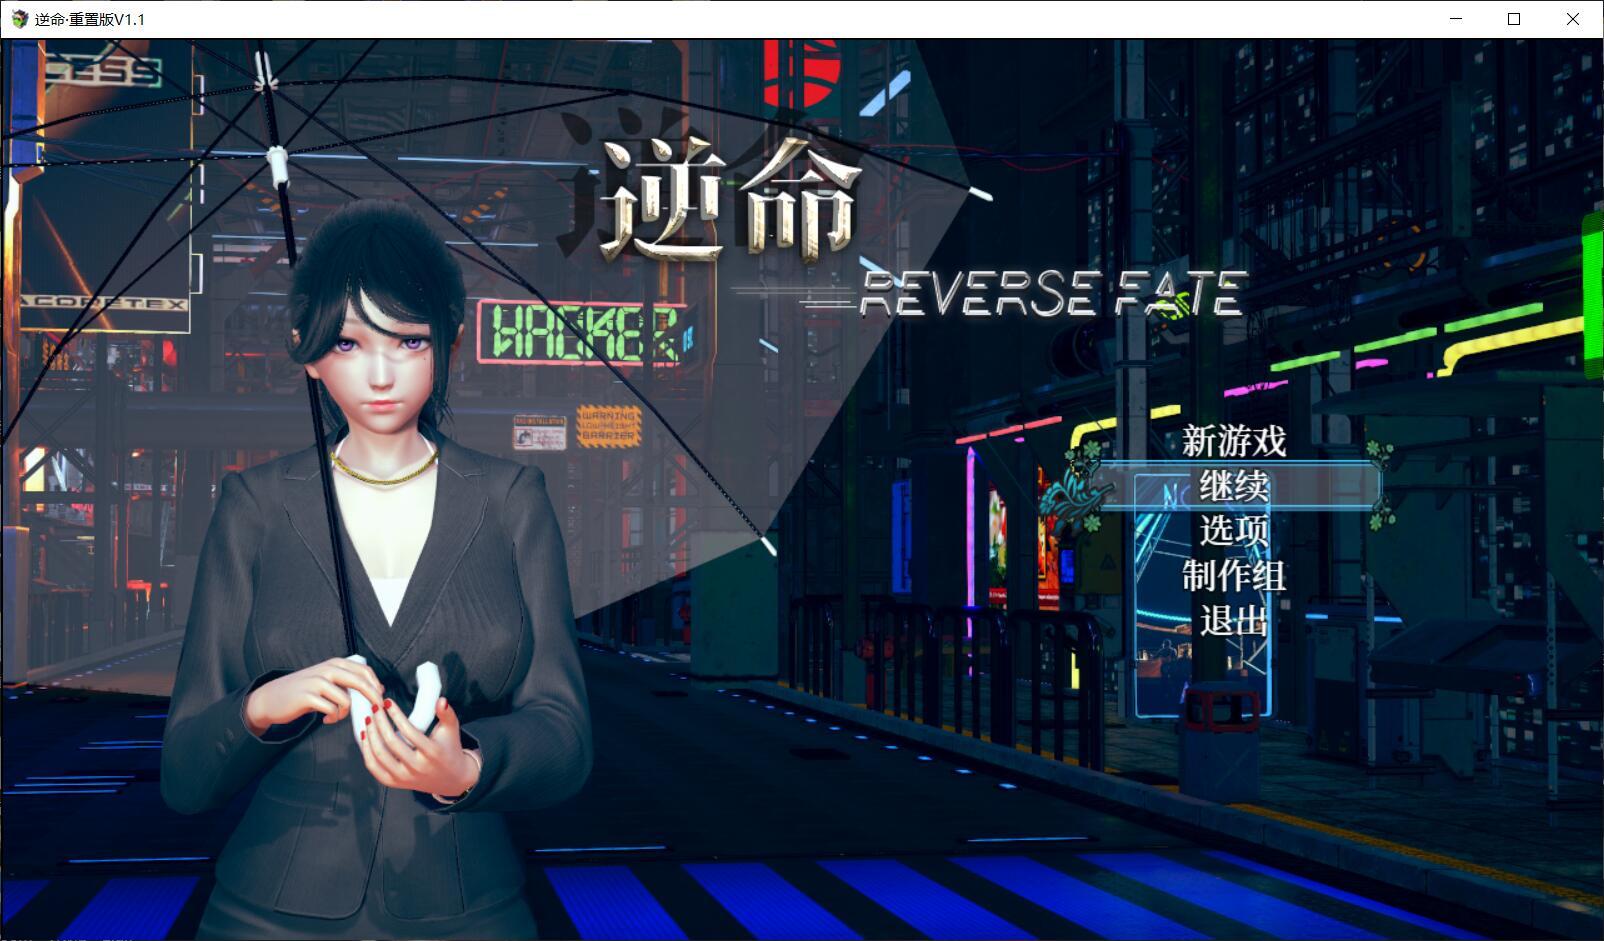 【RPG/中文/全动态】[全面重置]逆命REVERSE FATE V1.10重置版[增加CV]【3.3G/全CV】